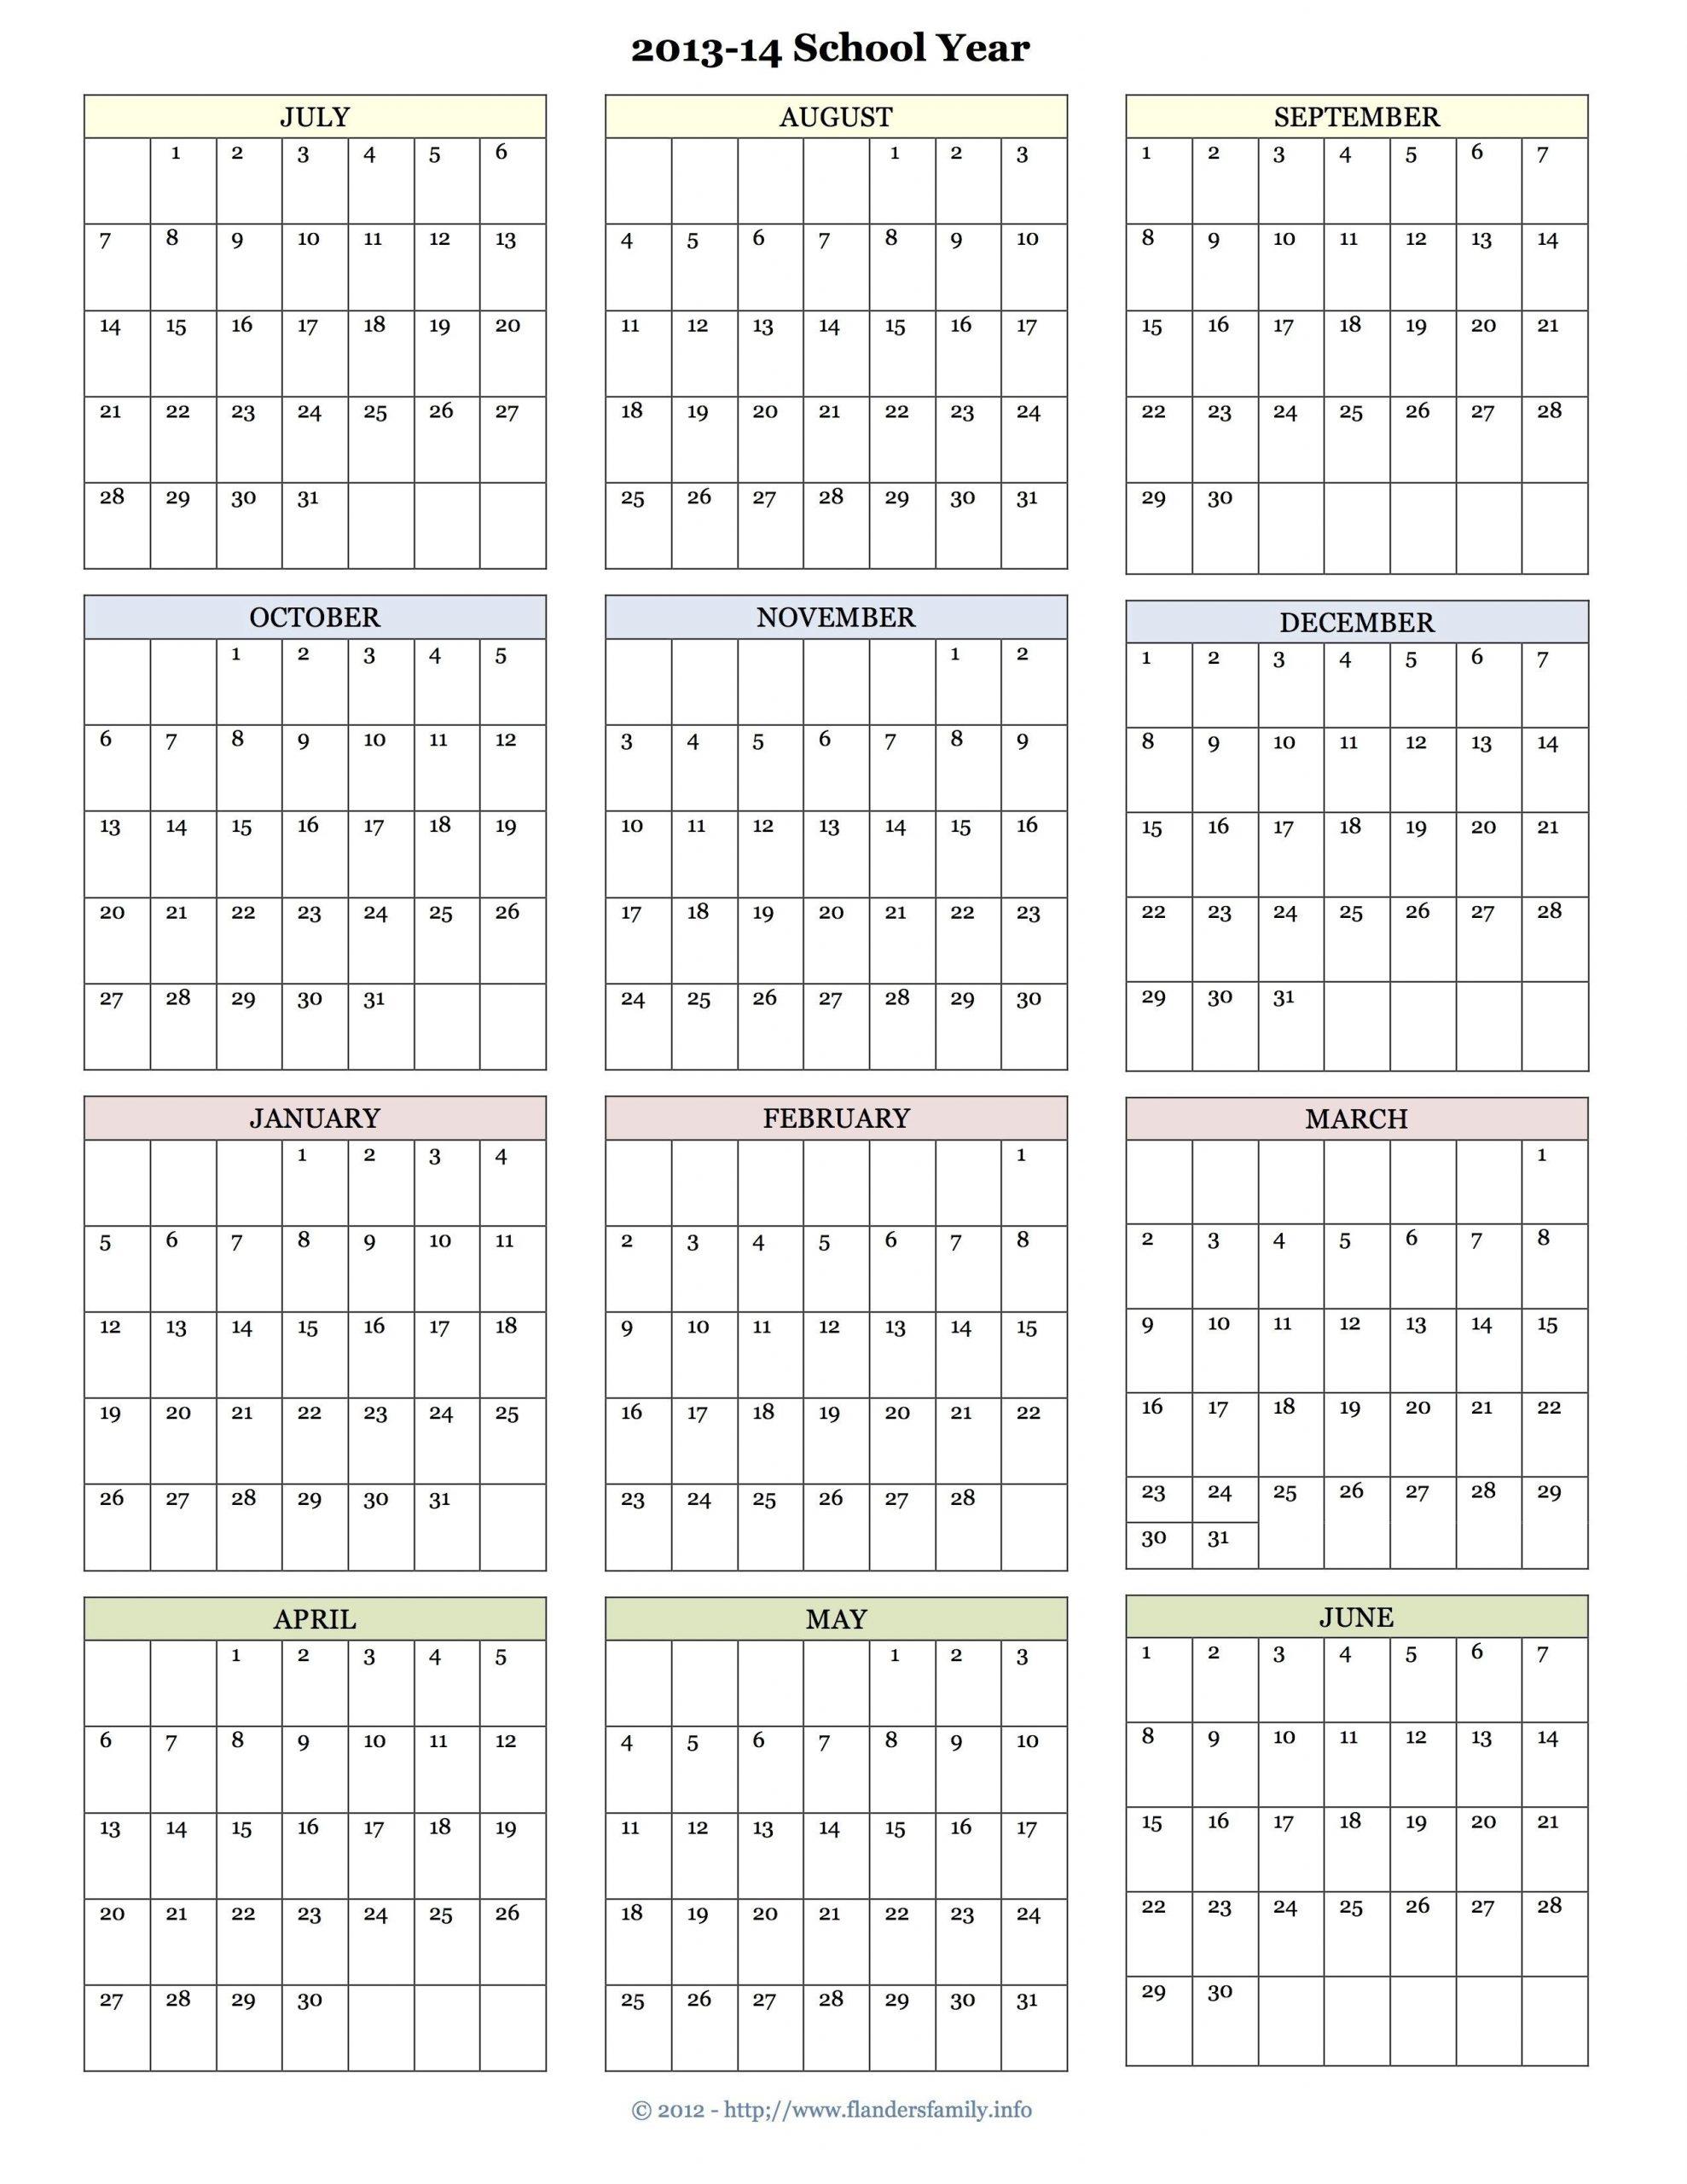 Depo Shot Calendar 2019 Depo Provera Injection Calendar 2018  Depo Provera Calendar 20 April 2021